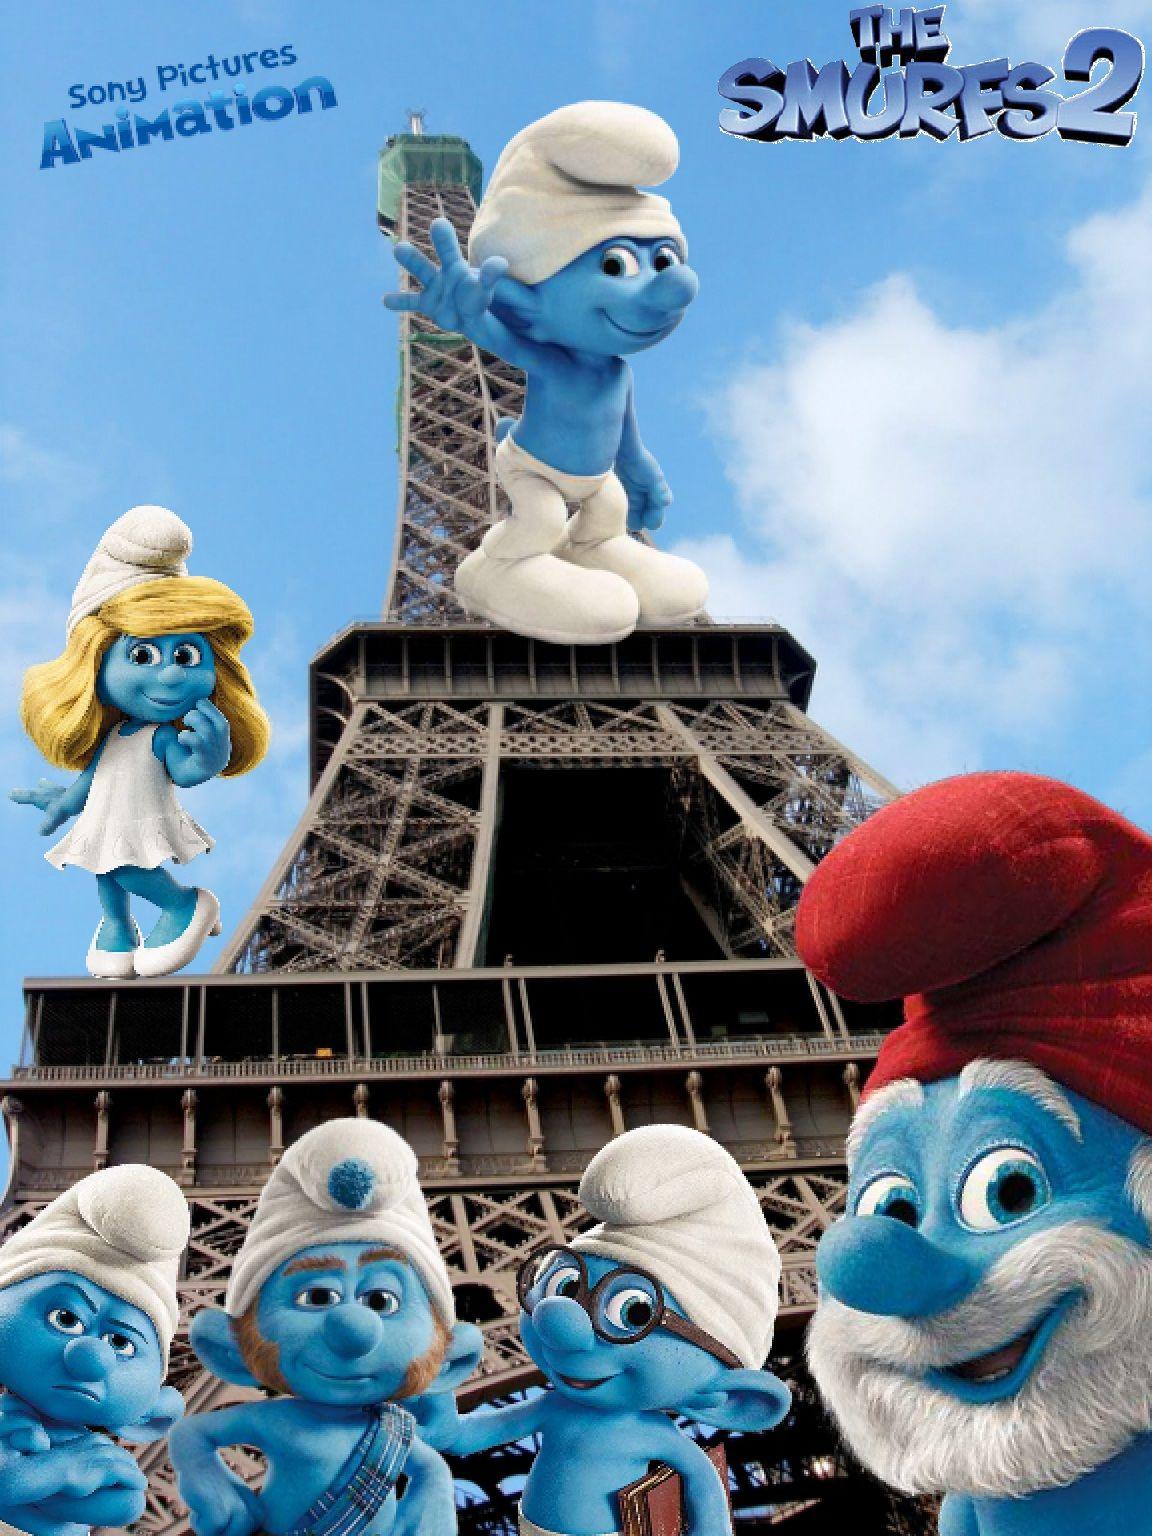 view full size. « new the smurfs 2 movie  | nostalgic films